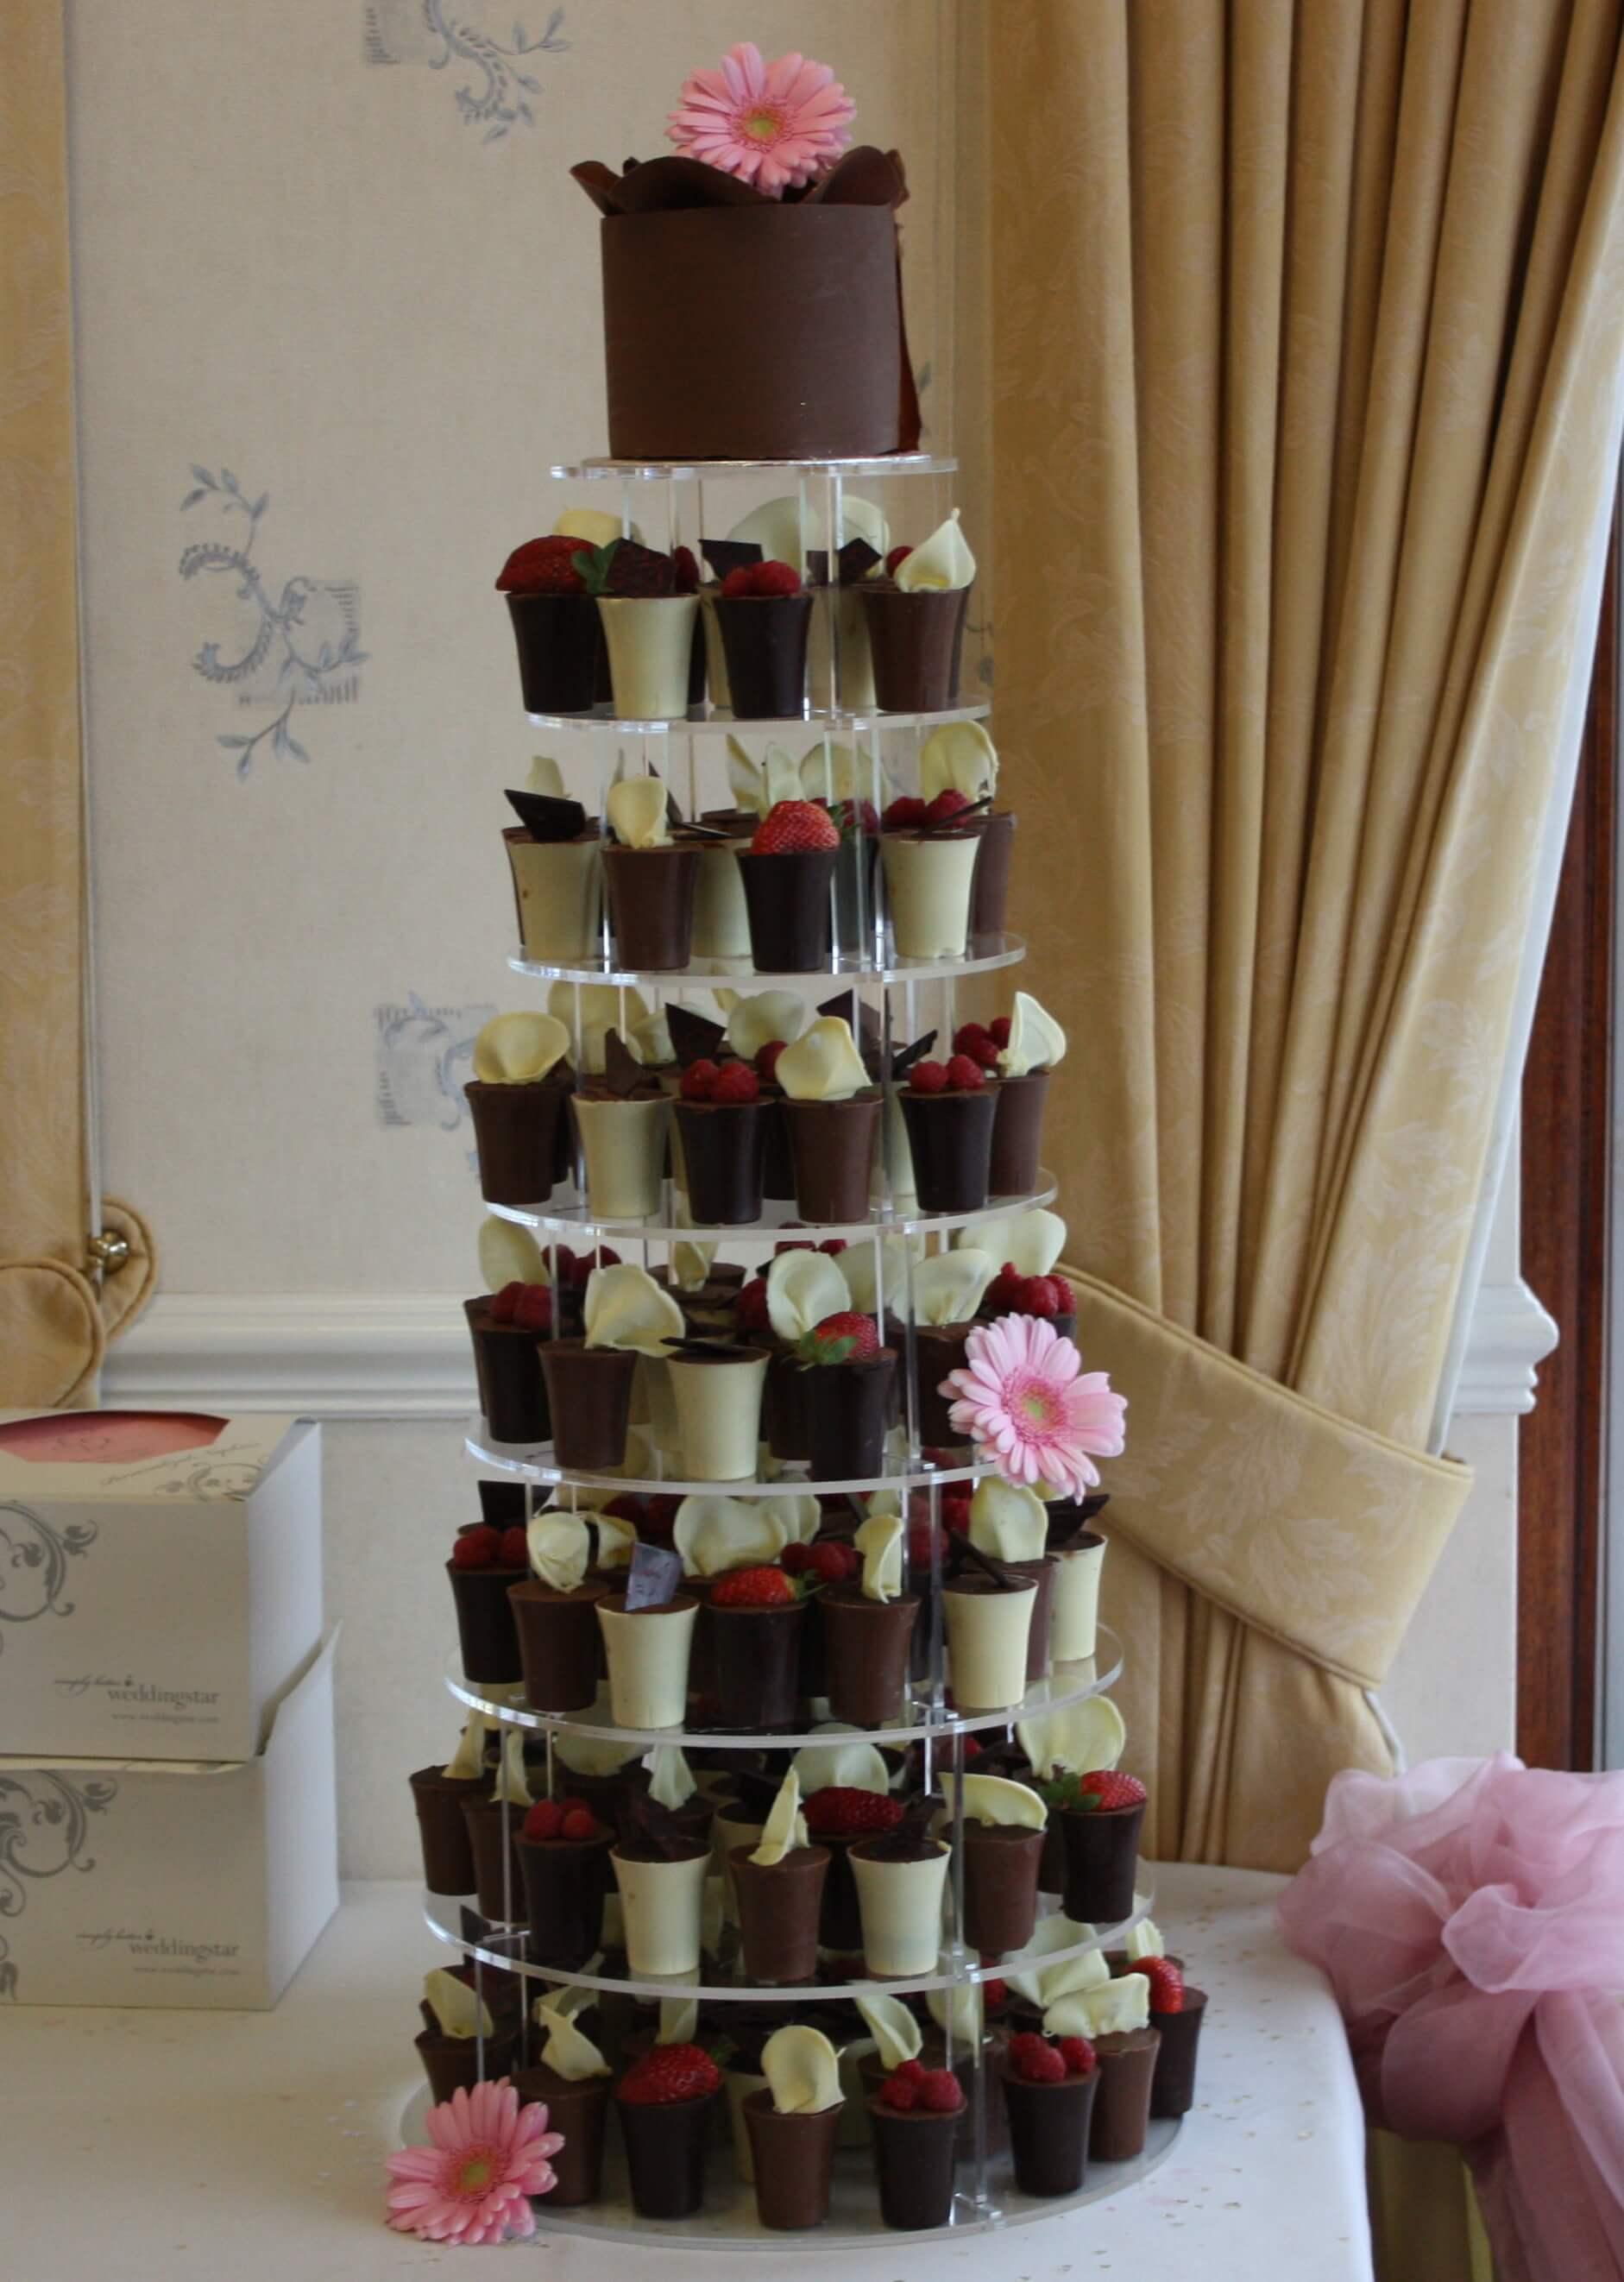 Chocolate Pots Sweet As Cakes   Award Winning ...